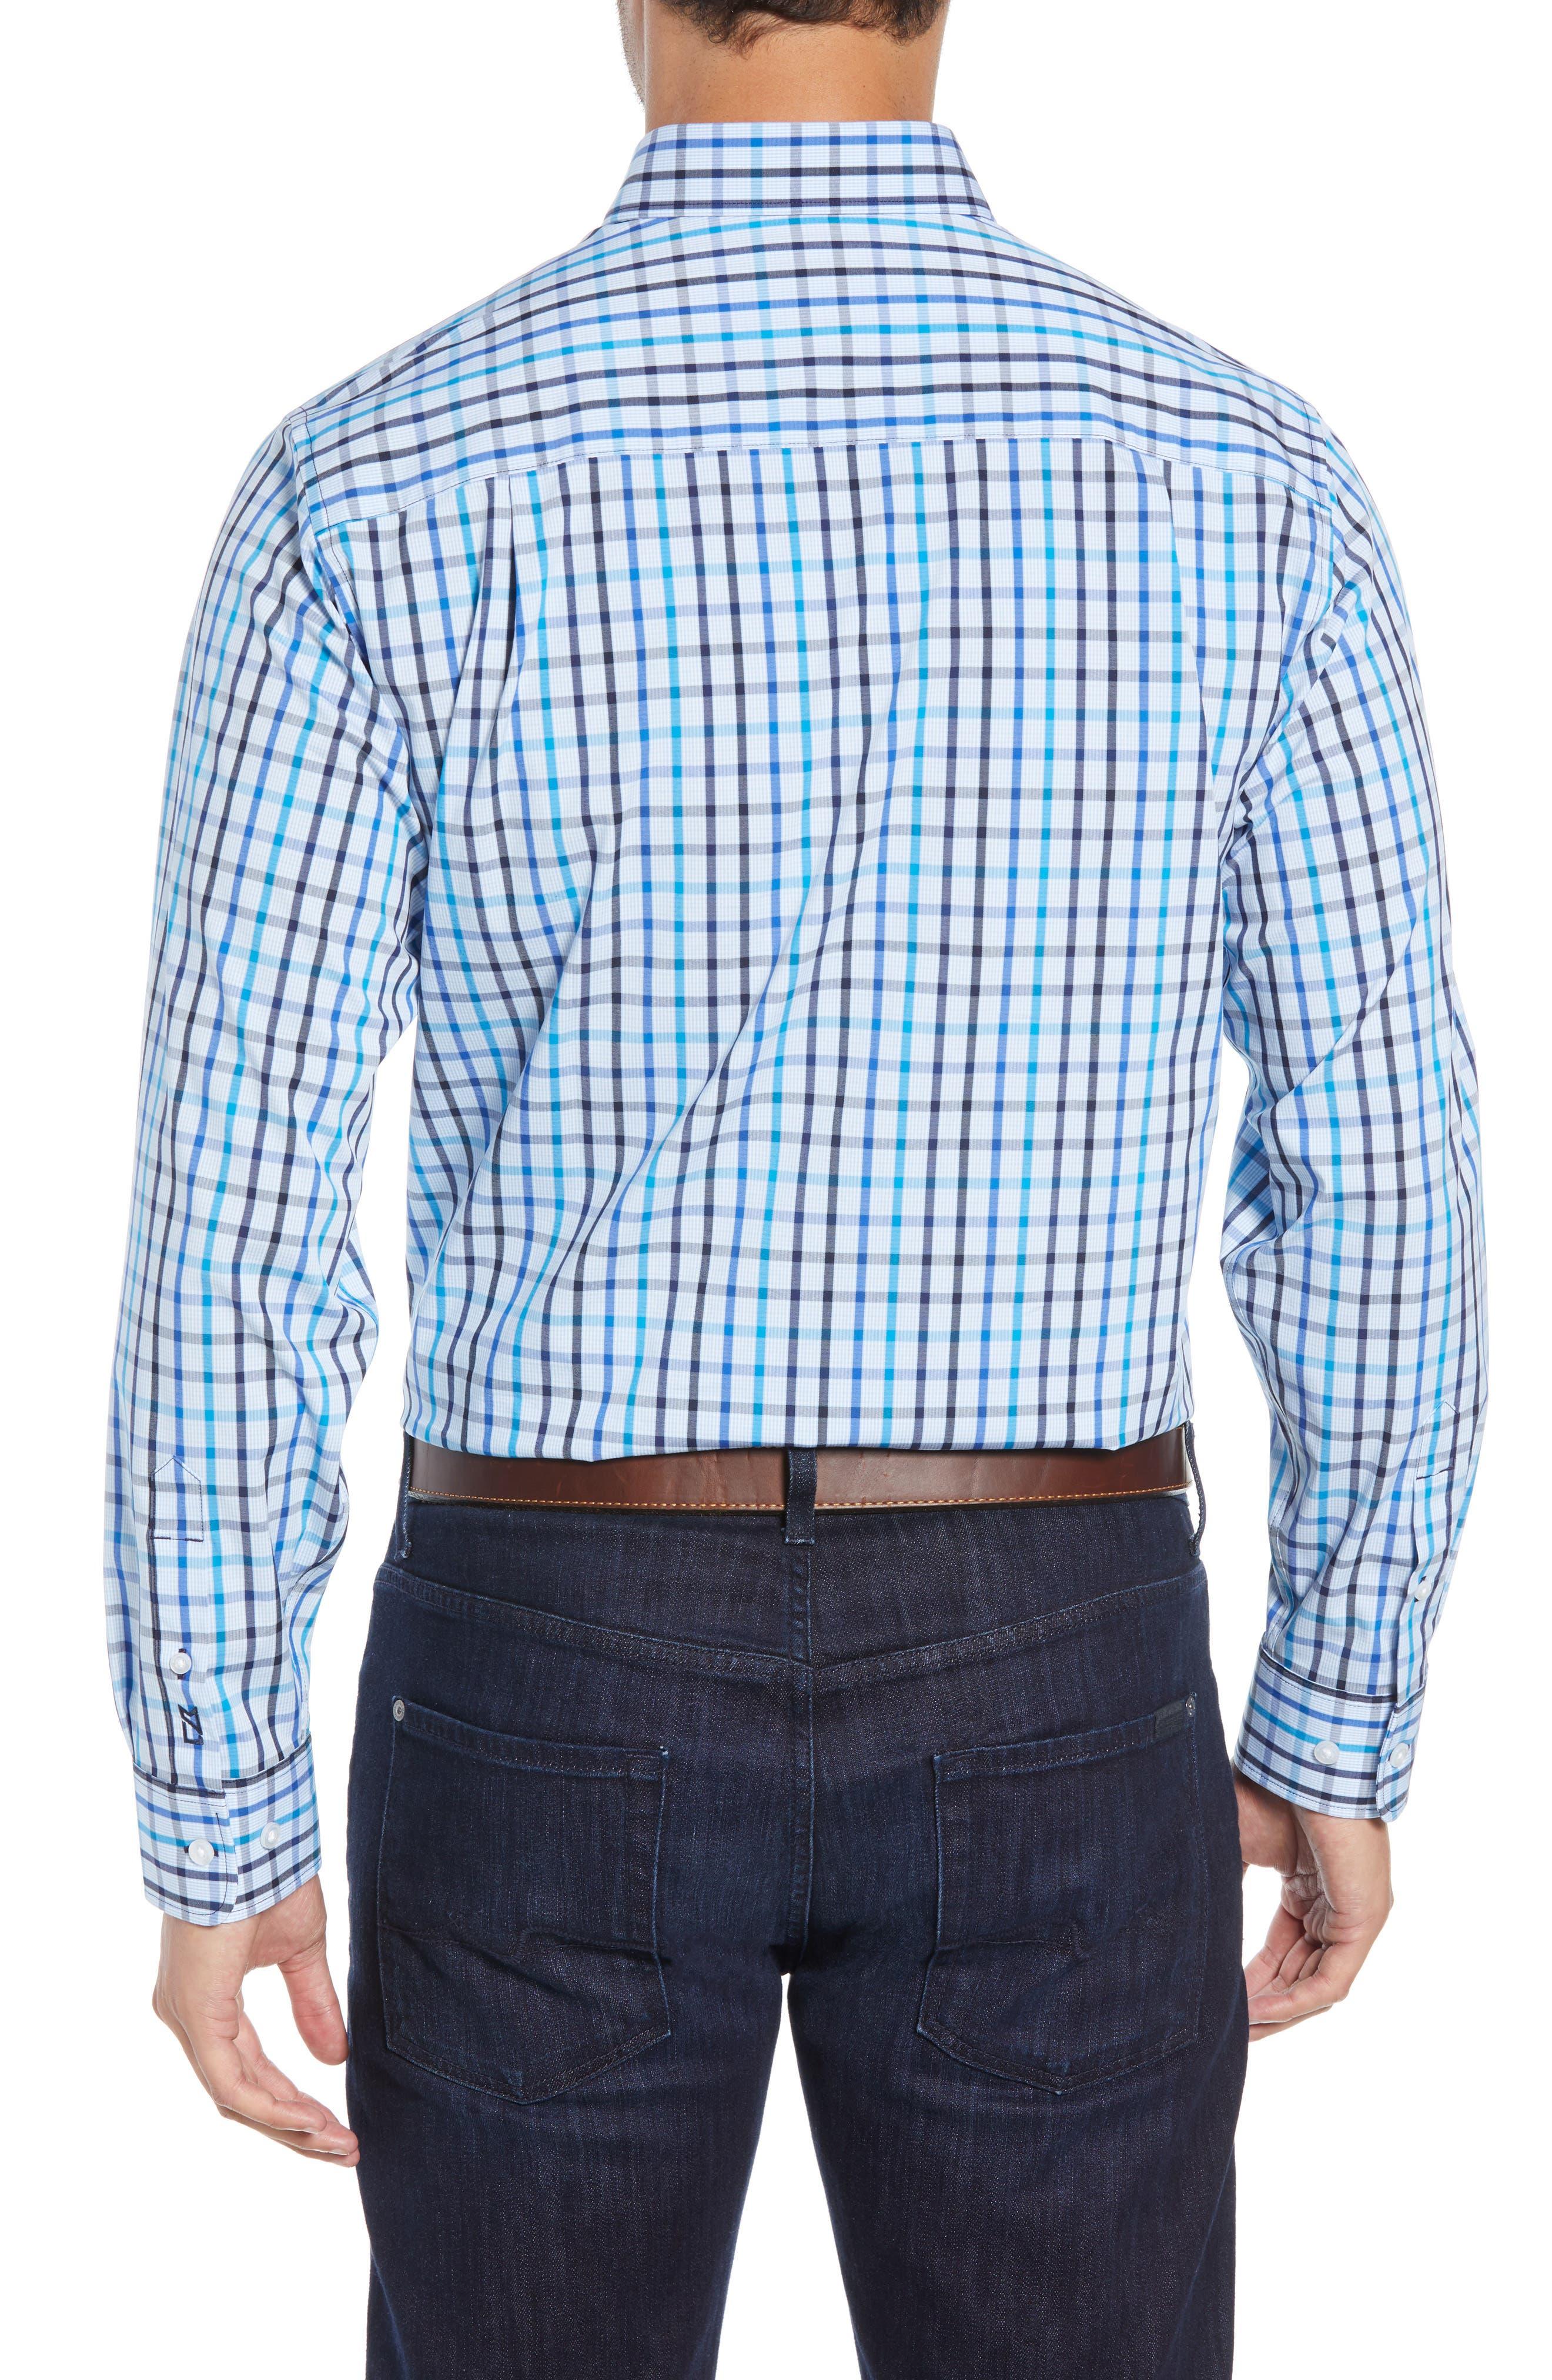 Clarence Regular Fit Plaid Sport Shirt,                             Alternate thumbnail 3, color,                             LIBERTY NAVY